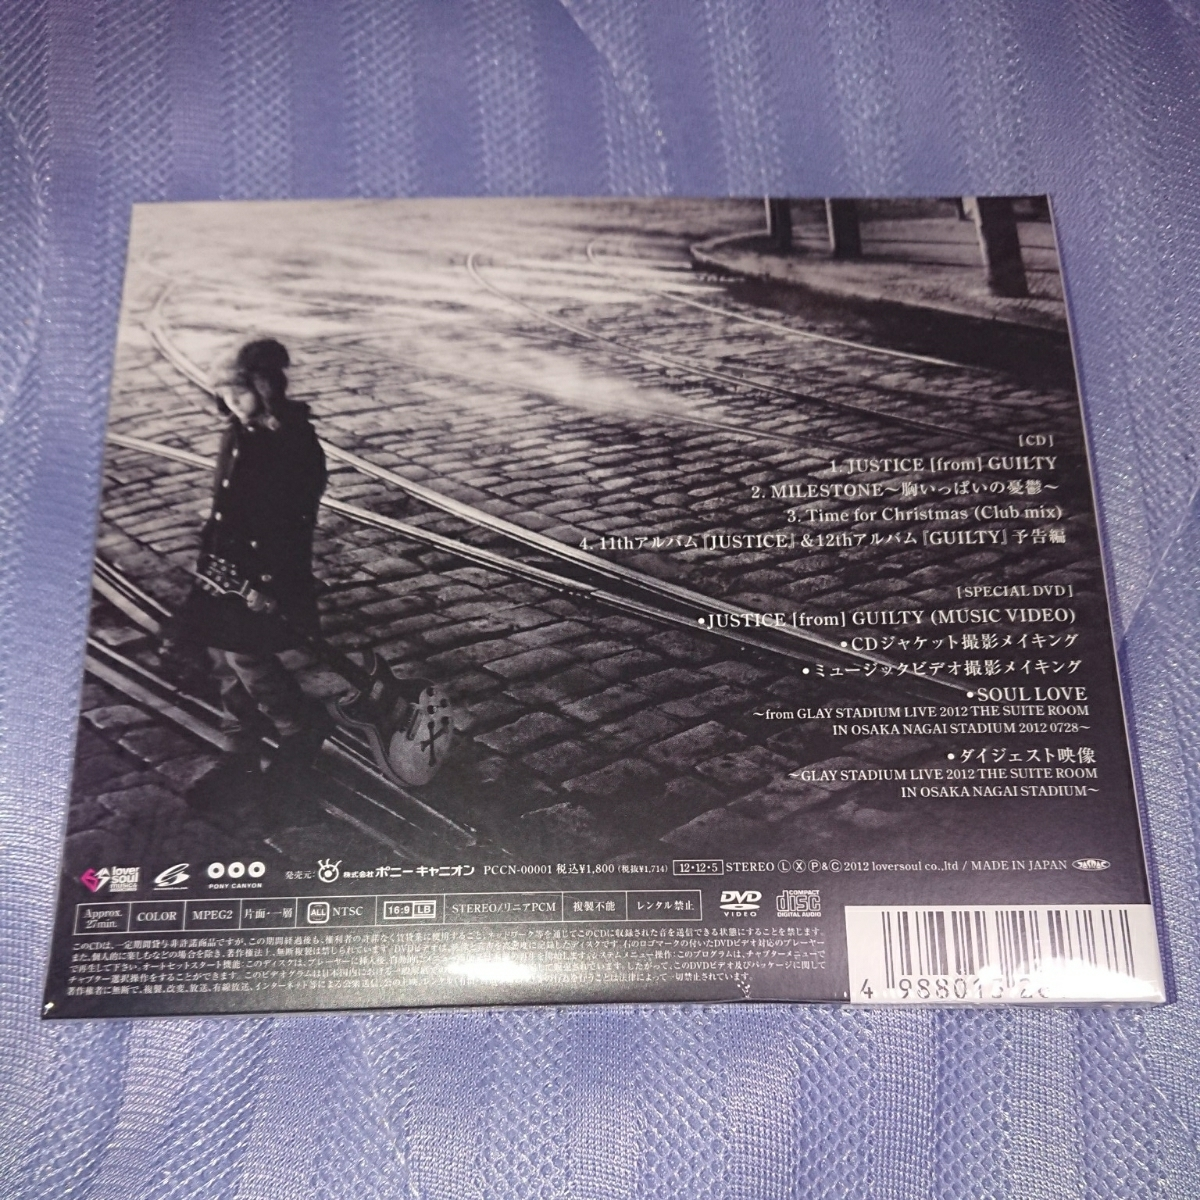 GLAY シングル JUSTICE [from] GUILTY 新品未開封 美品 初回限定 DVD TERU TAKURO HISASHI JIRO 即決_画像2